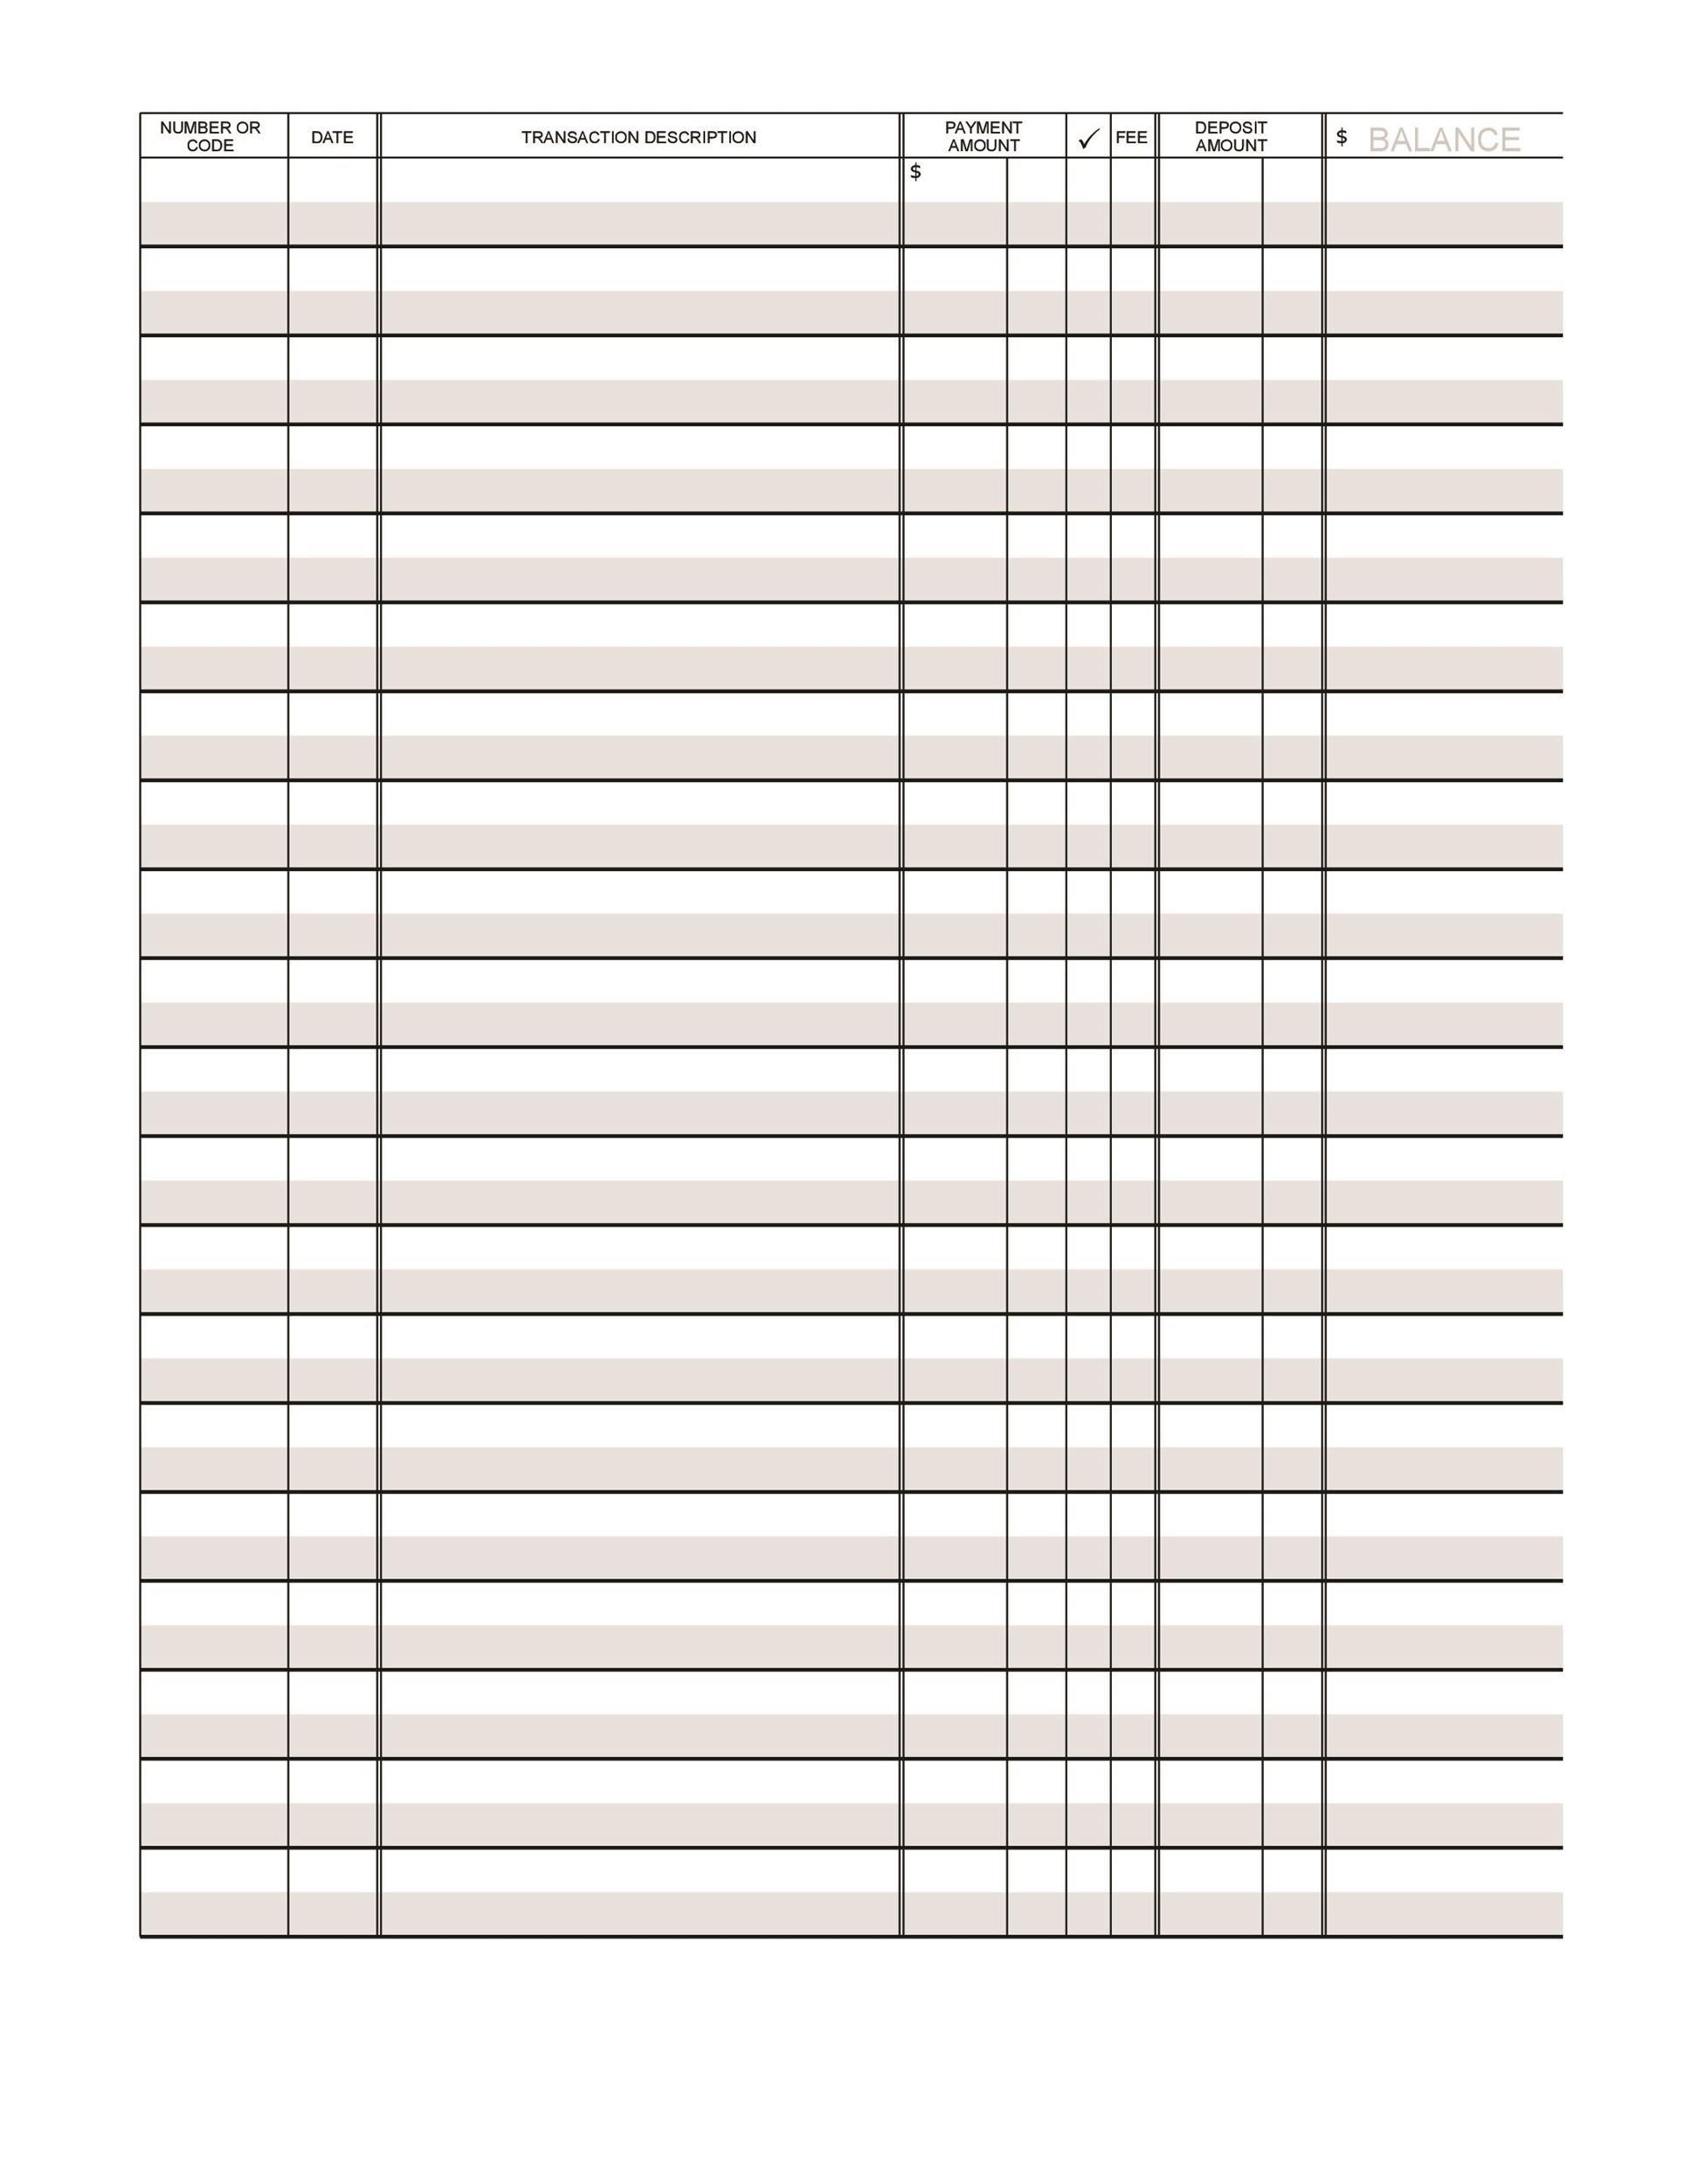 003 Impressive Check Register Template Printable Inspiration  Pdf ExcelFull